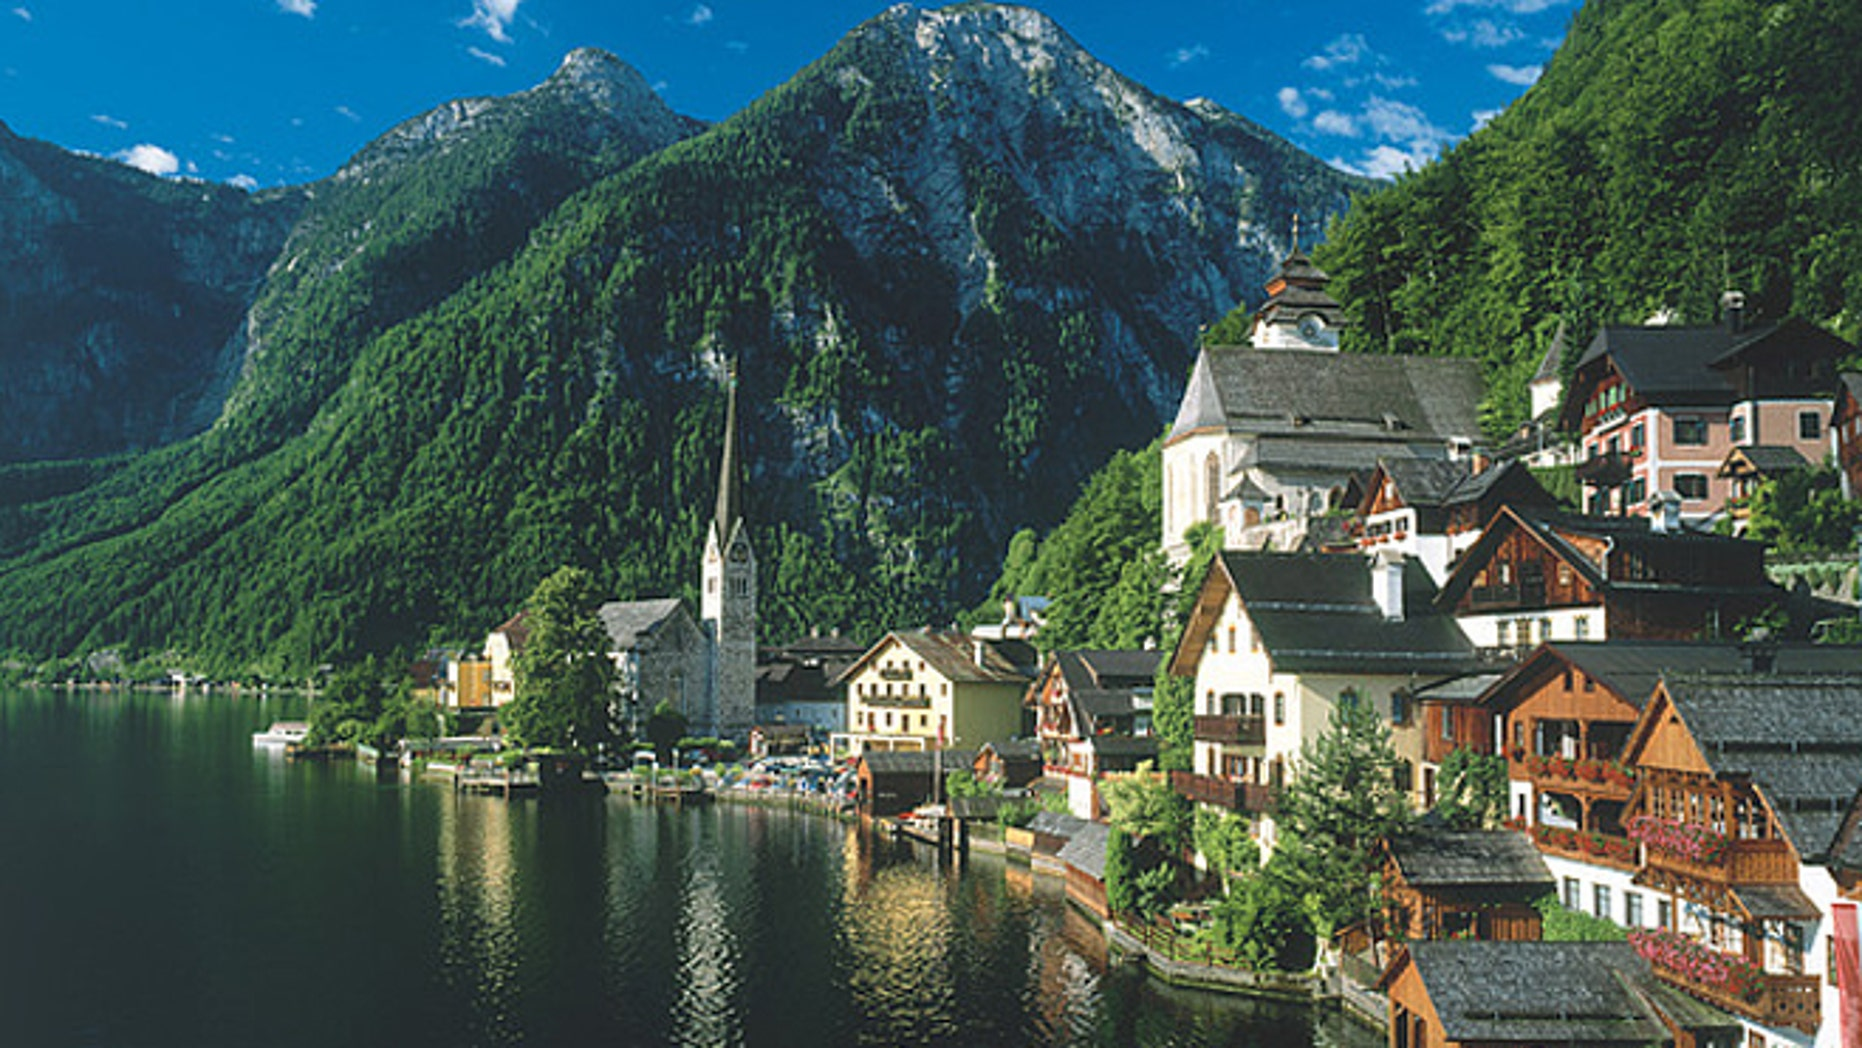 The popular tourist village of Hallstatt, Austria. (Austrian National Tourist Office)